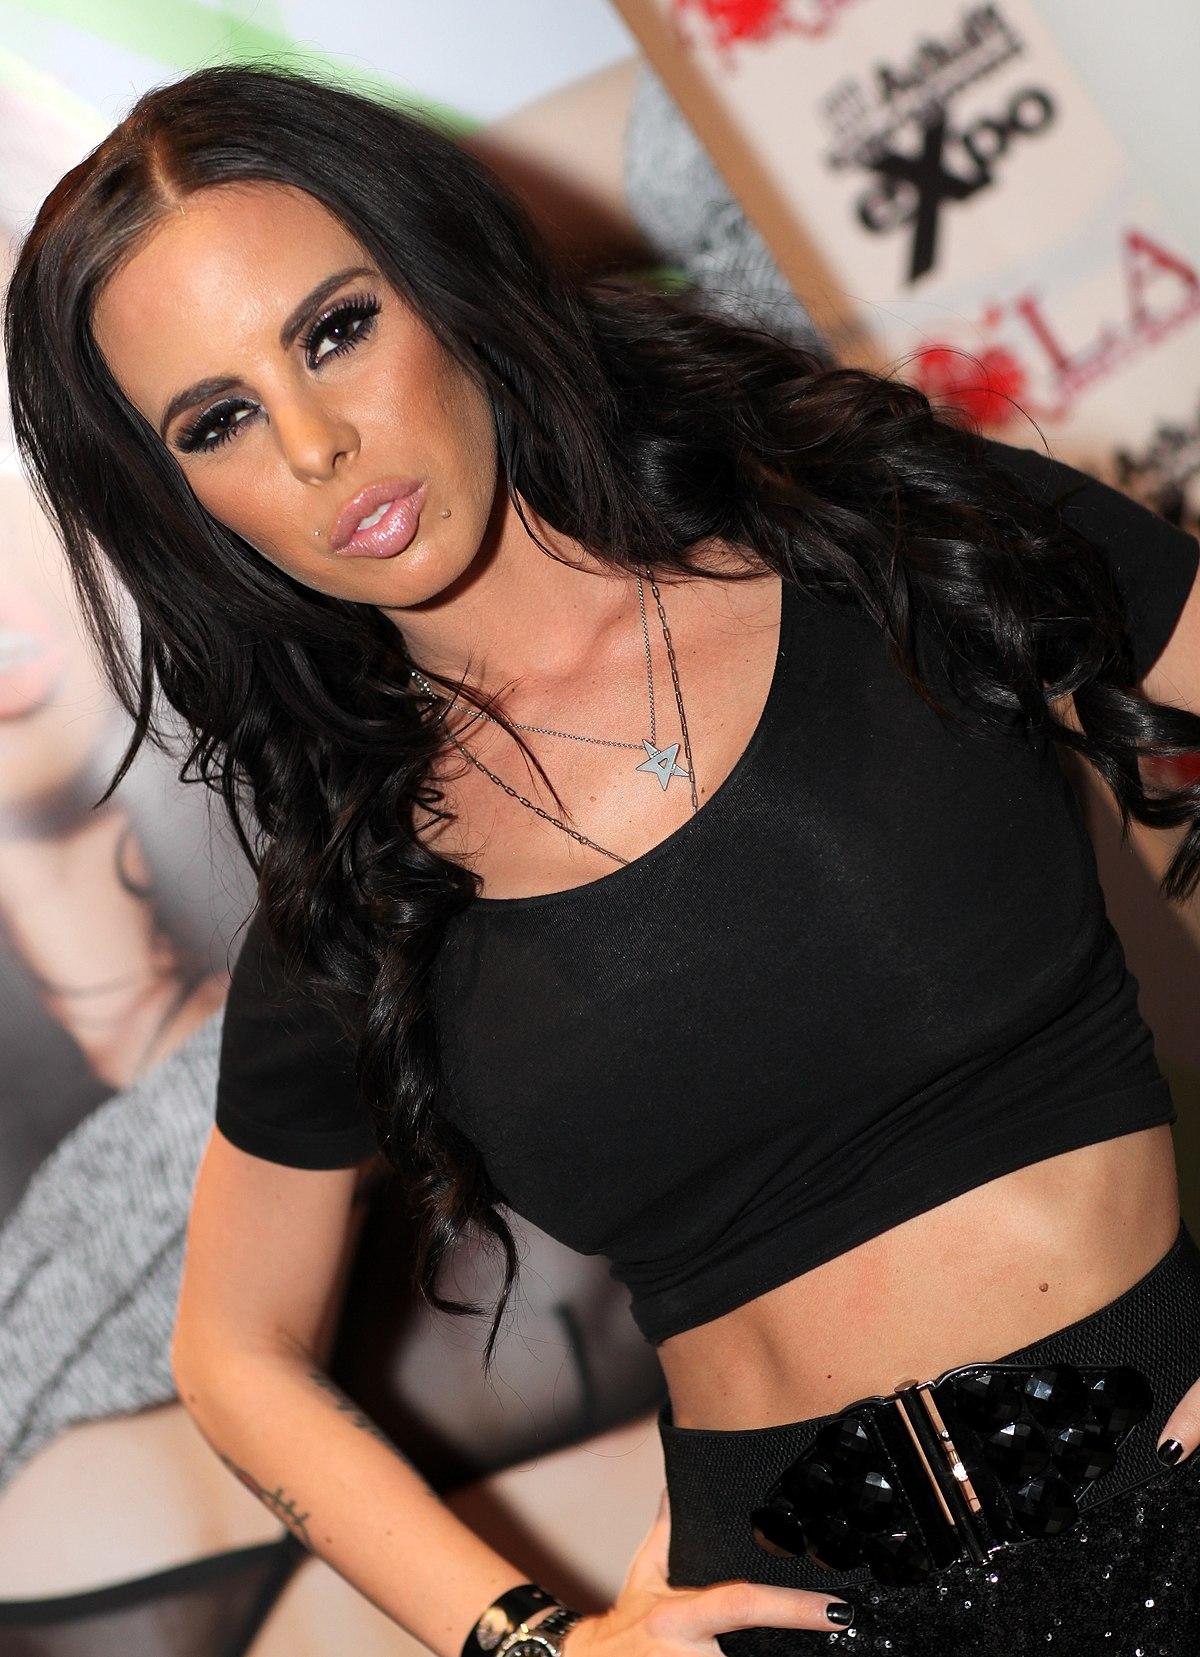 Heather Brooke Porn Star with brandy aniston - wikipedia